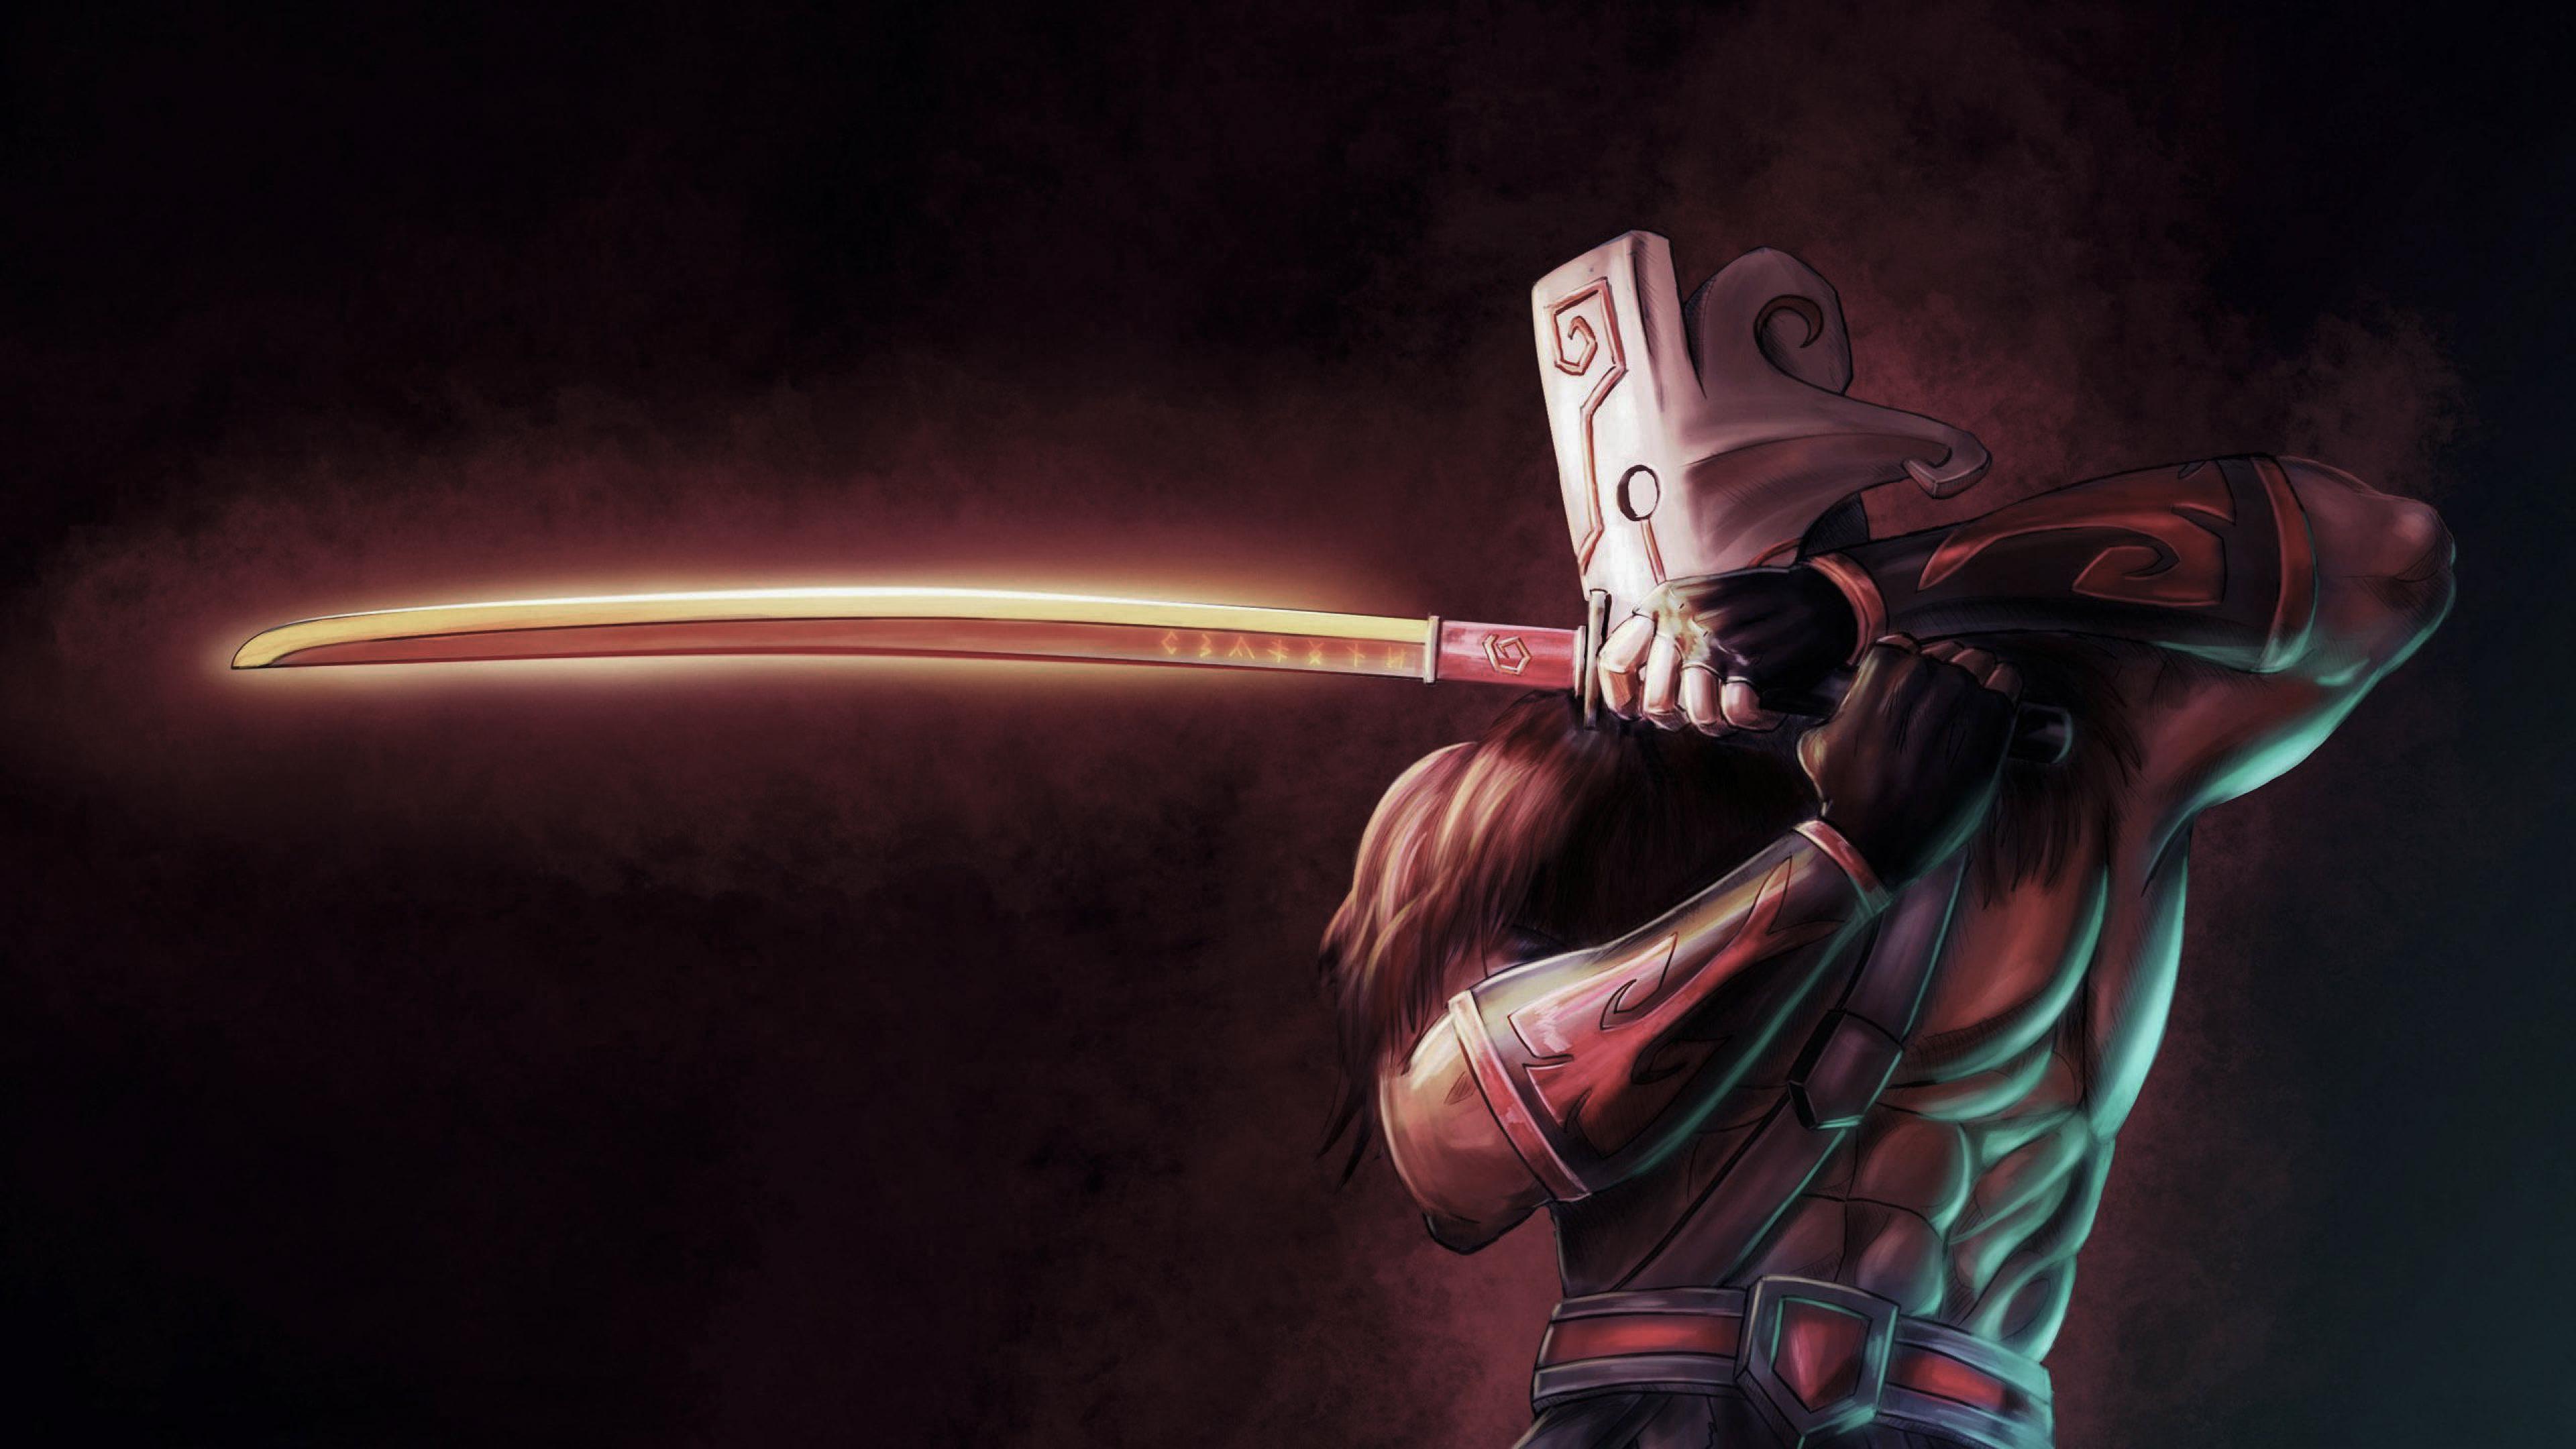 Juggernaut Dota 2 Hd Games 4k Wallpapers Images